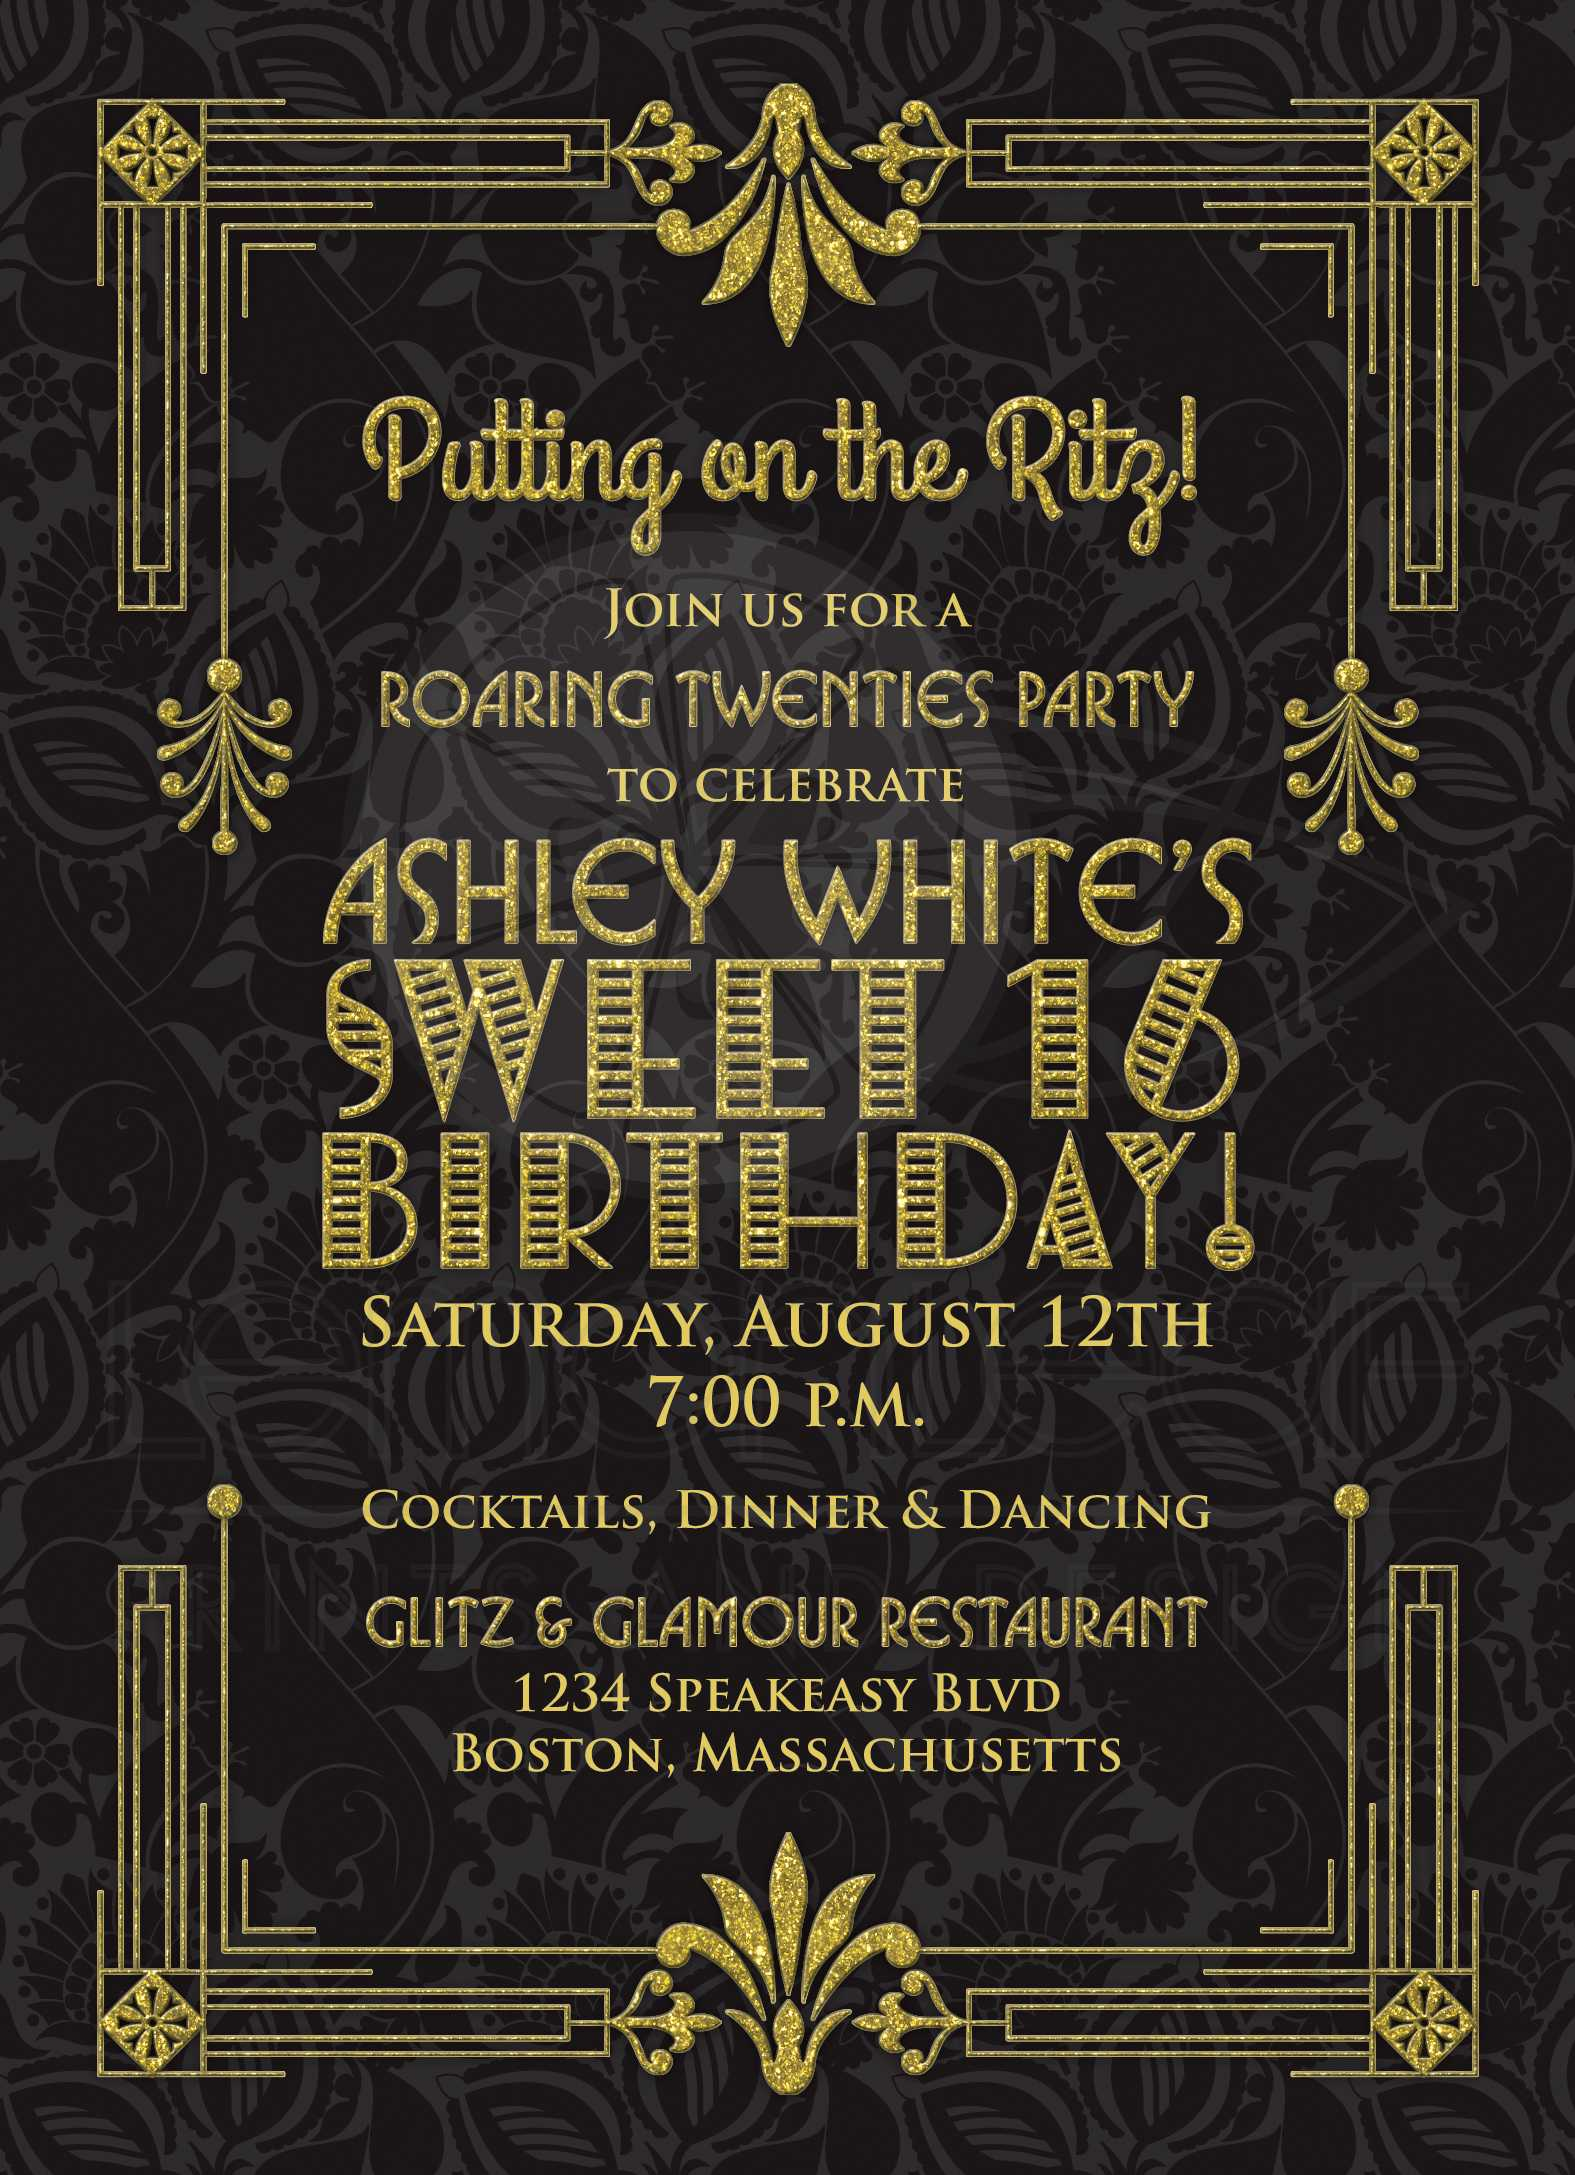 Sweet 16 Birthday Invitation | Roaring 20s Art Deco Black Gold